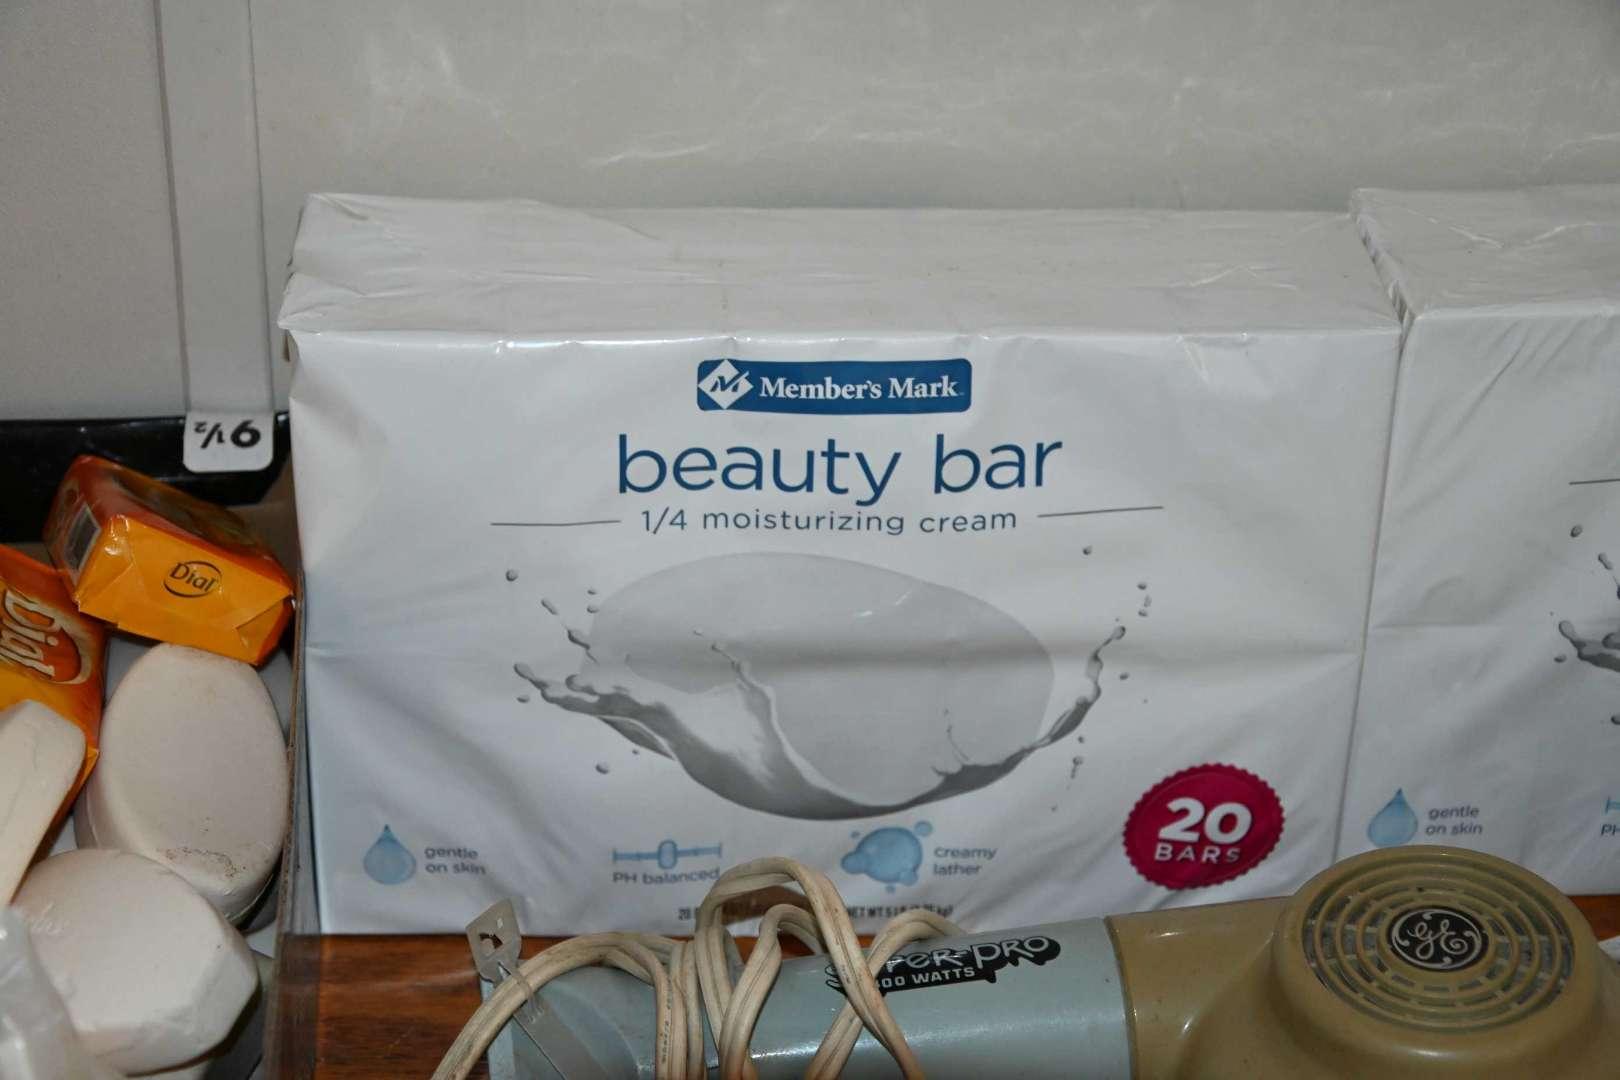 Lot # 202 Hand soap, beauty soap, hair dryer & iron